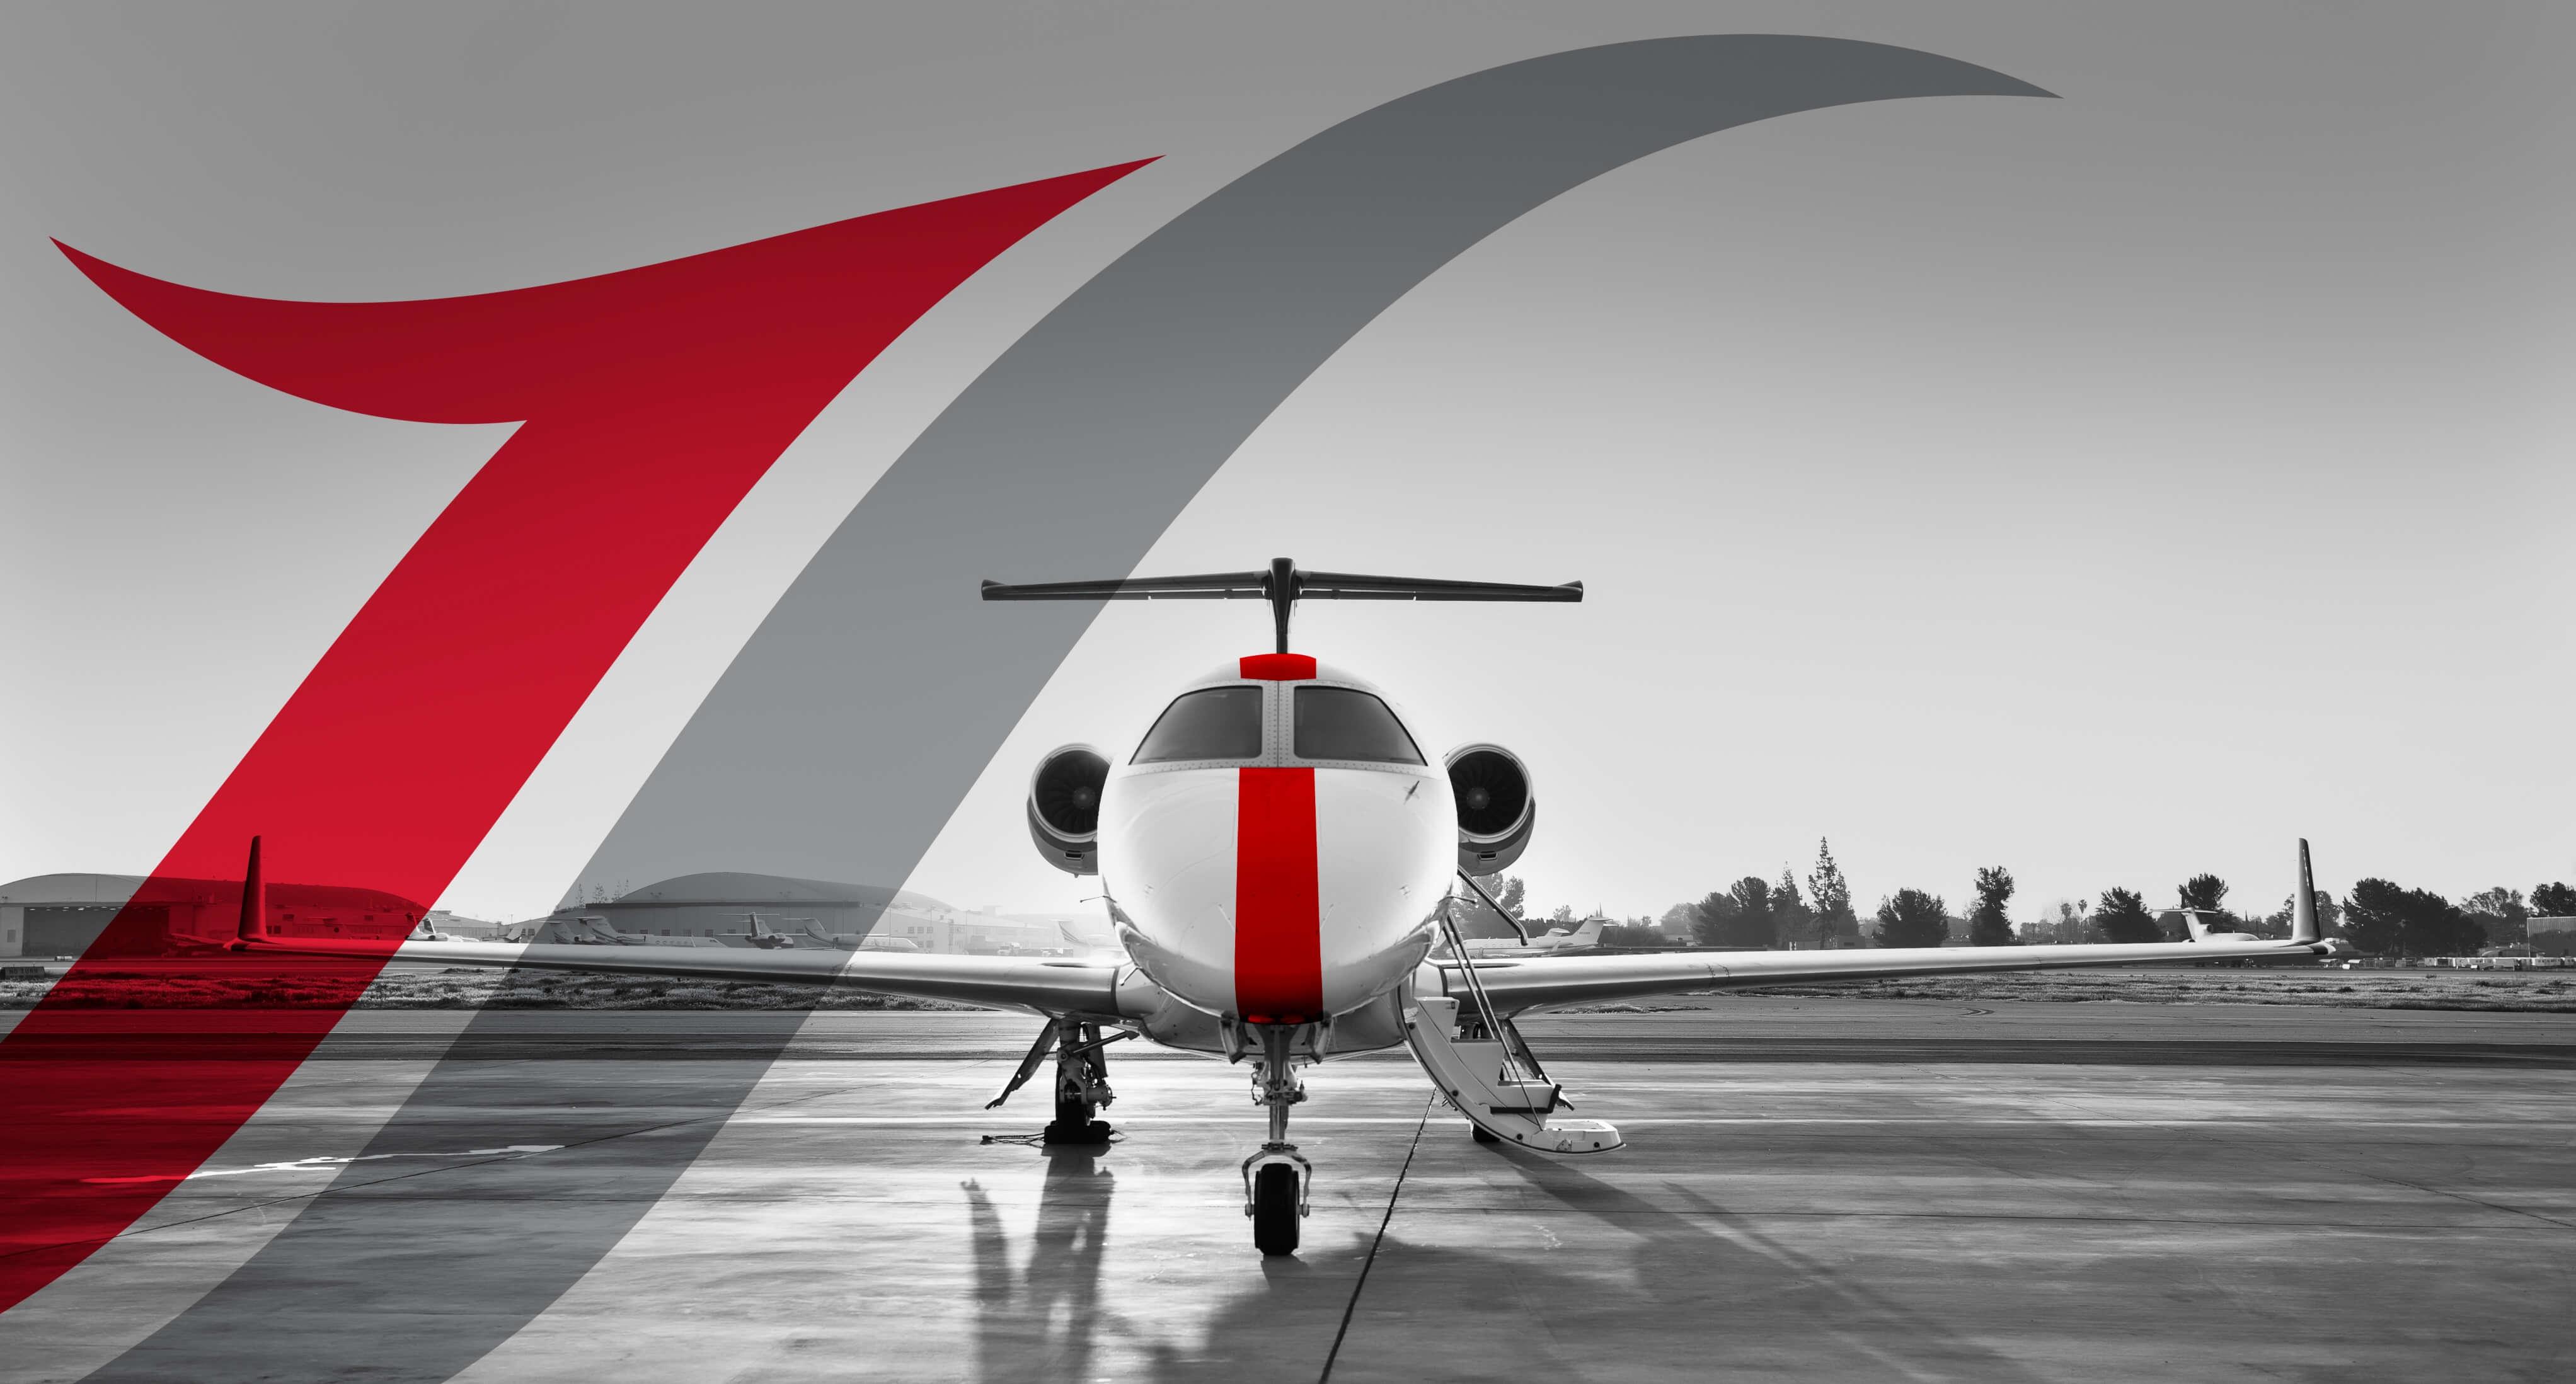 JetSuite | Private Jet Charter Flights – Private Jet Rental